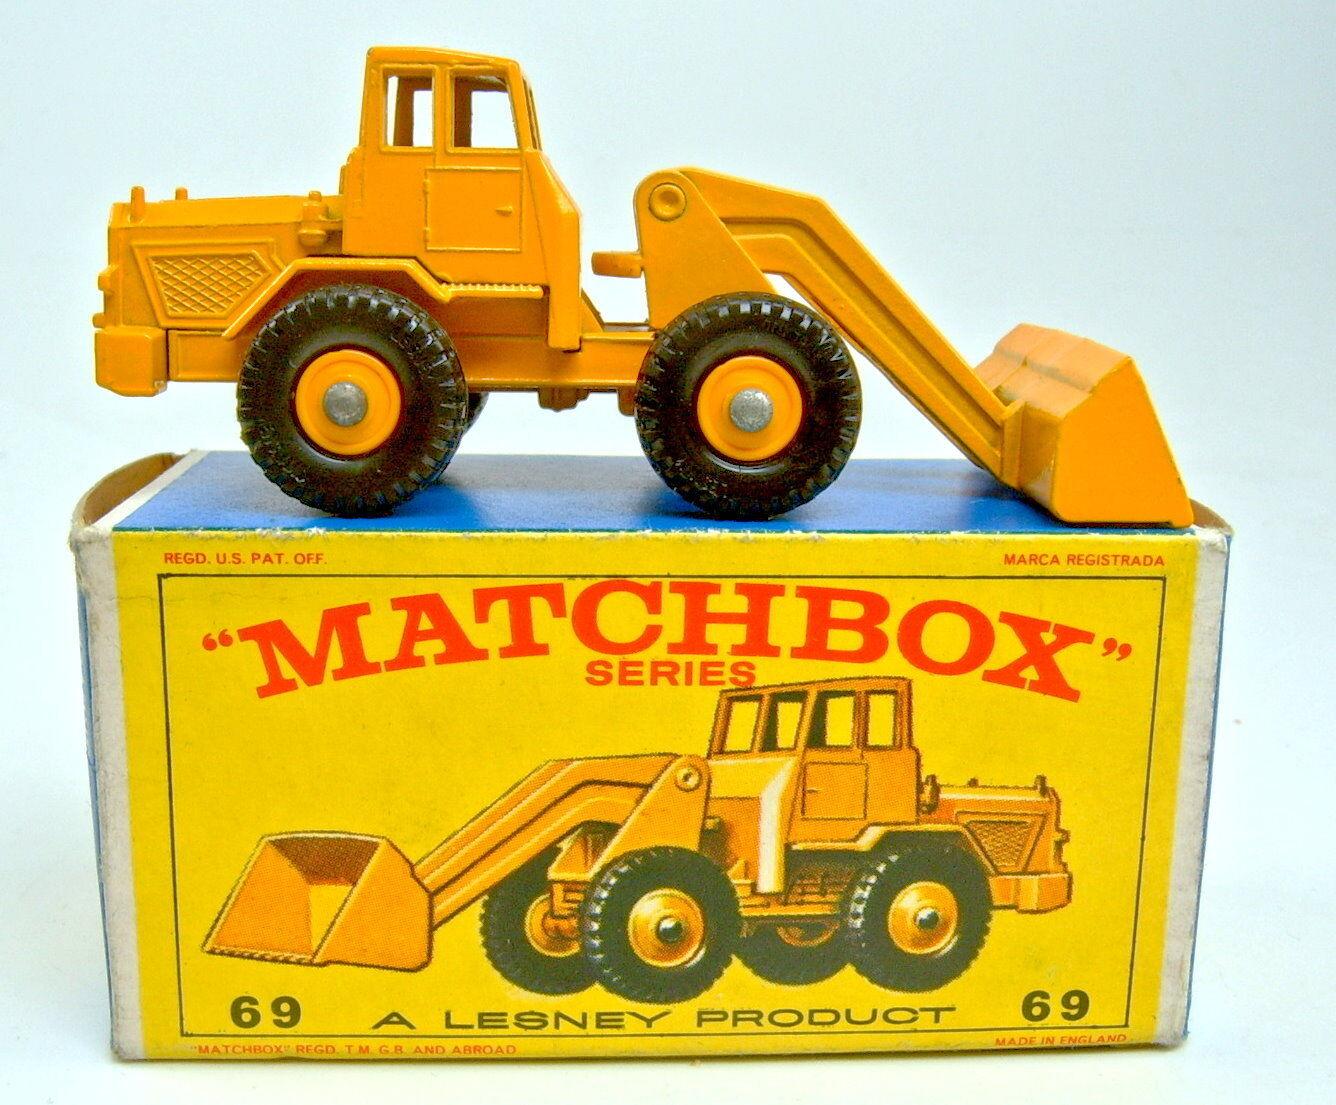 Matchlåda RW 69B Hatra Tractor Shovel gul top i låda